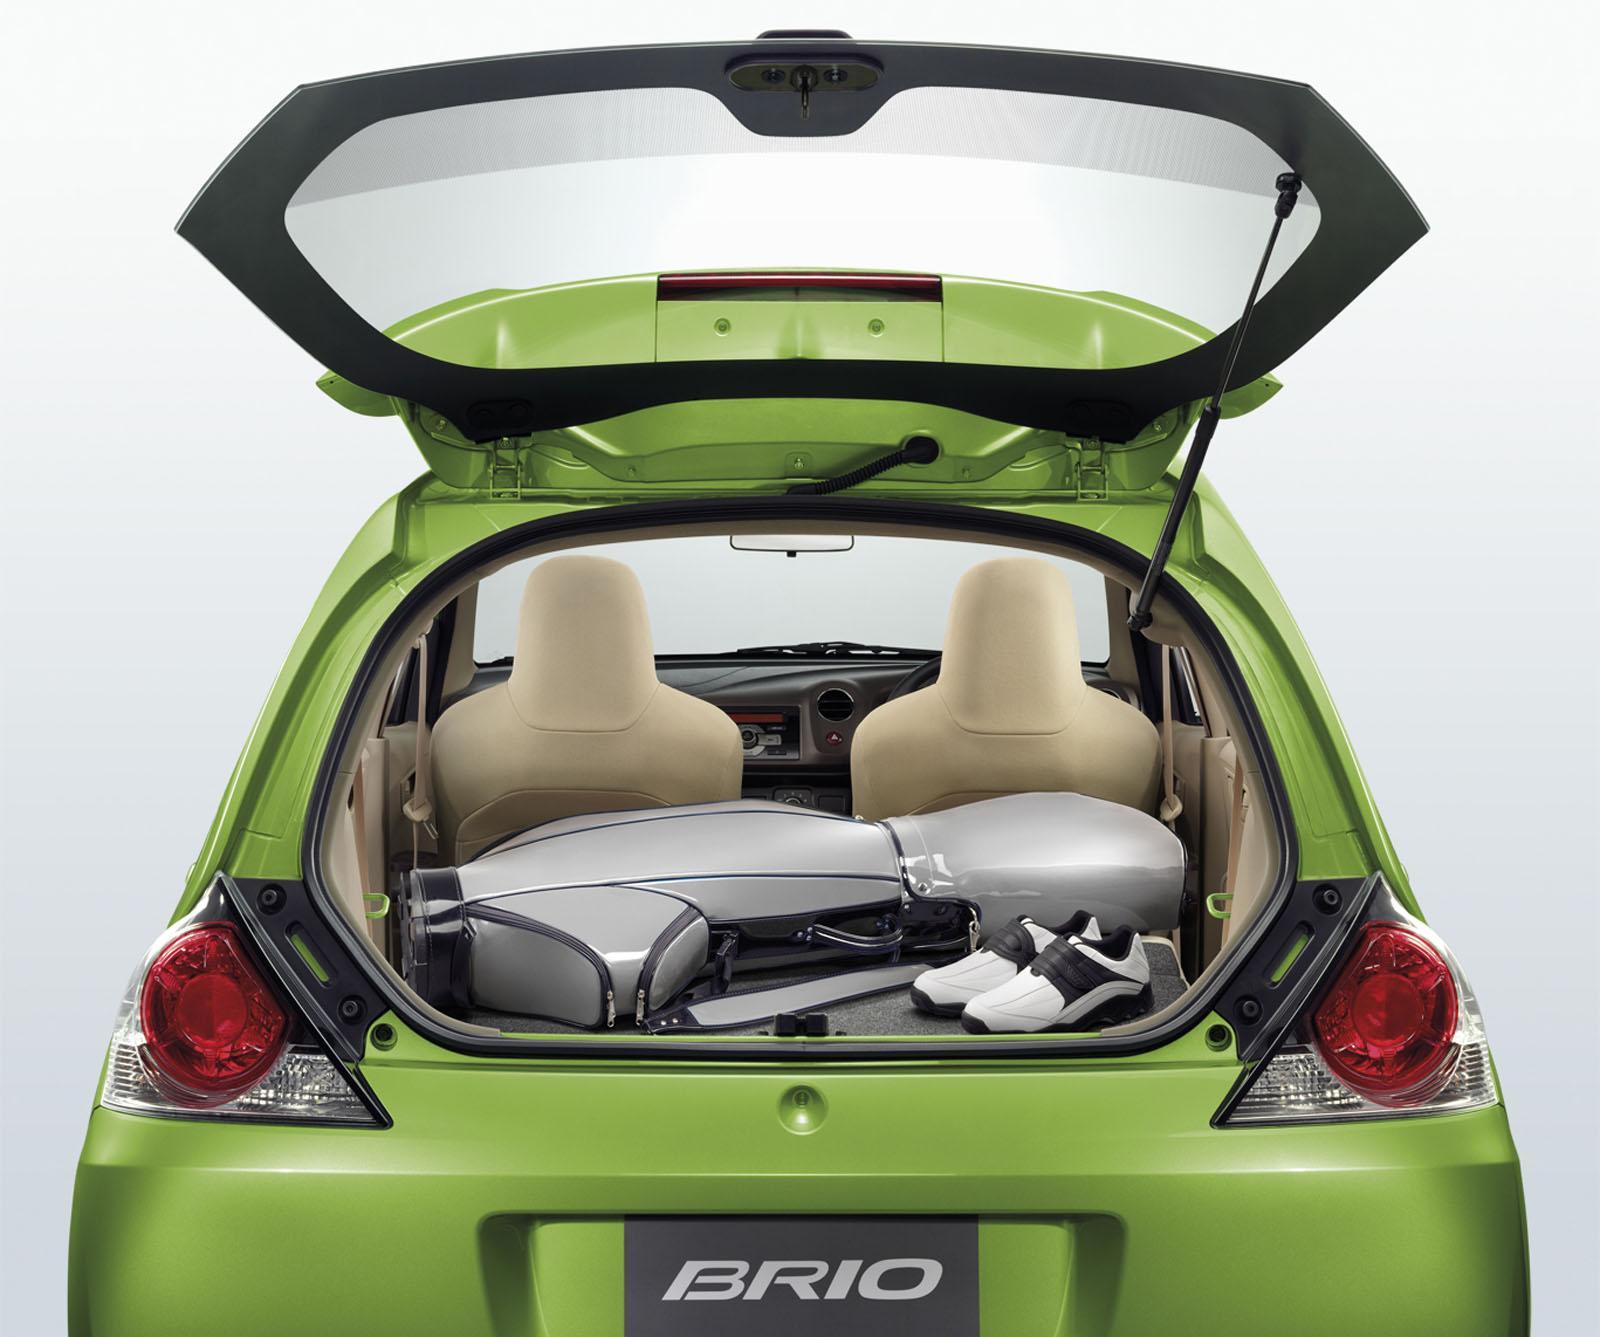 http://4.bp.blogspot.com/-8XeTgkFYhdc/TcA0UHXp-yI/AAAAAAAACtw/myAUbNubk-g/s1600/2011-Honda-Brio-02.jpg